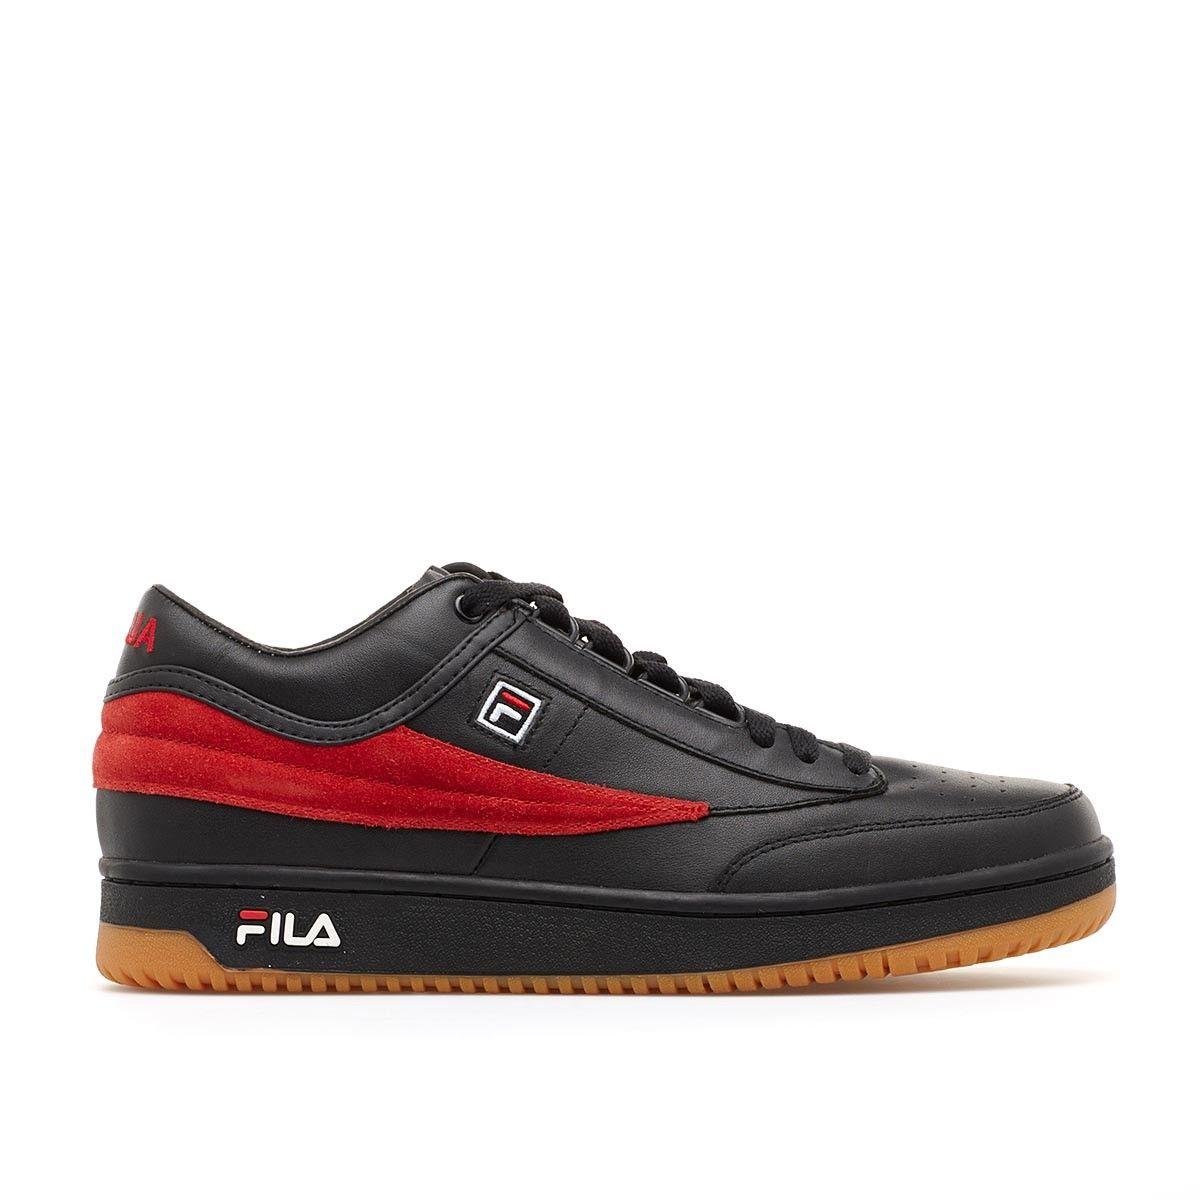 Adidas Jeremy Scott Sneakers Wings Blackout 2.0 Instinct shoes G00616 size 85